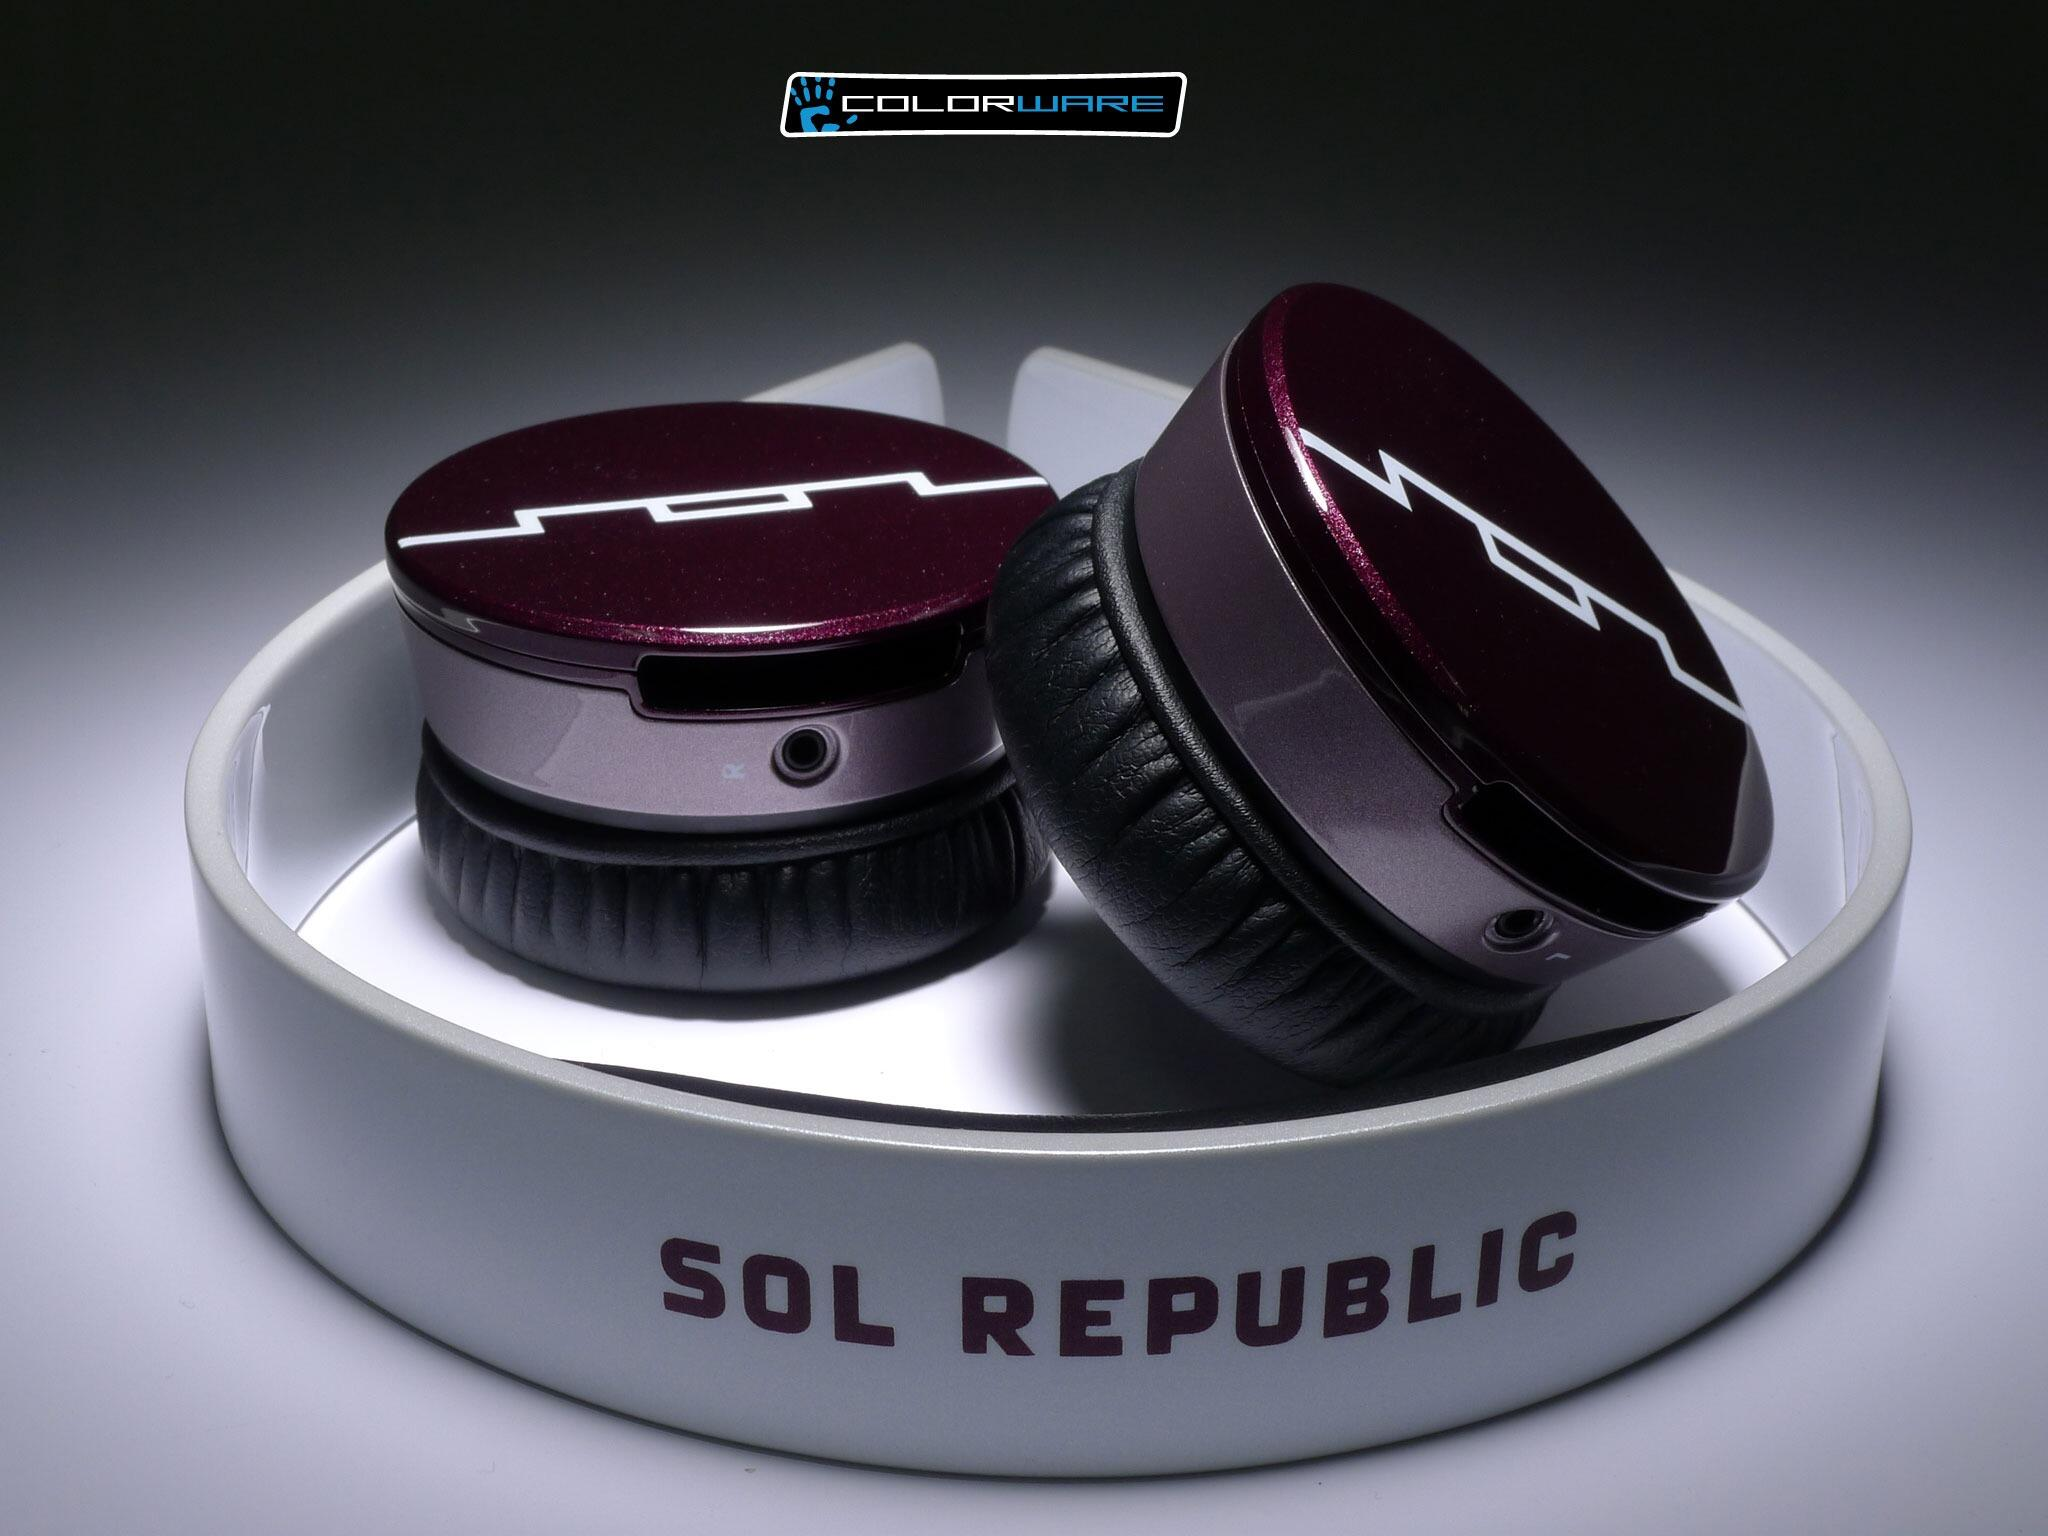 Give your headphones a splash of color! #colorware #custom #solrepublic #headphones http://t.co/op3nTuIFh3